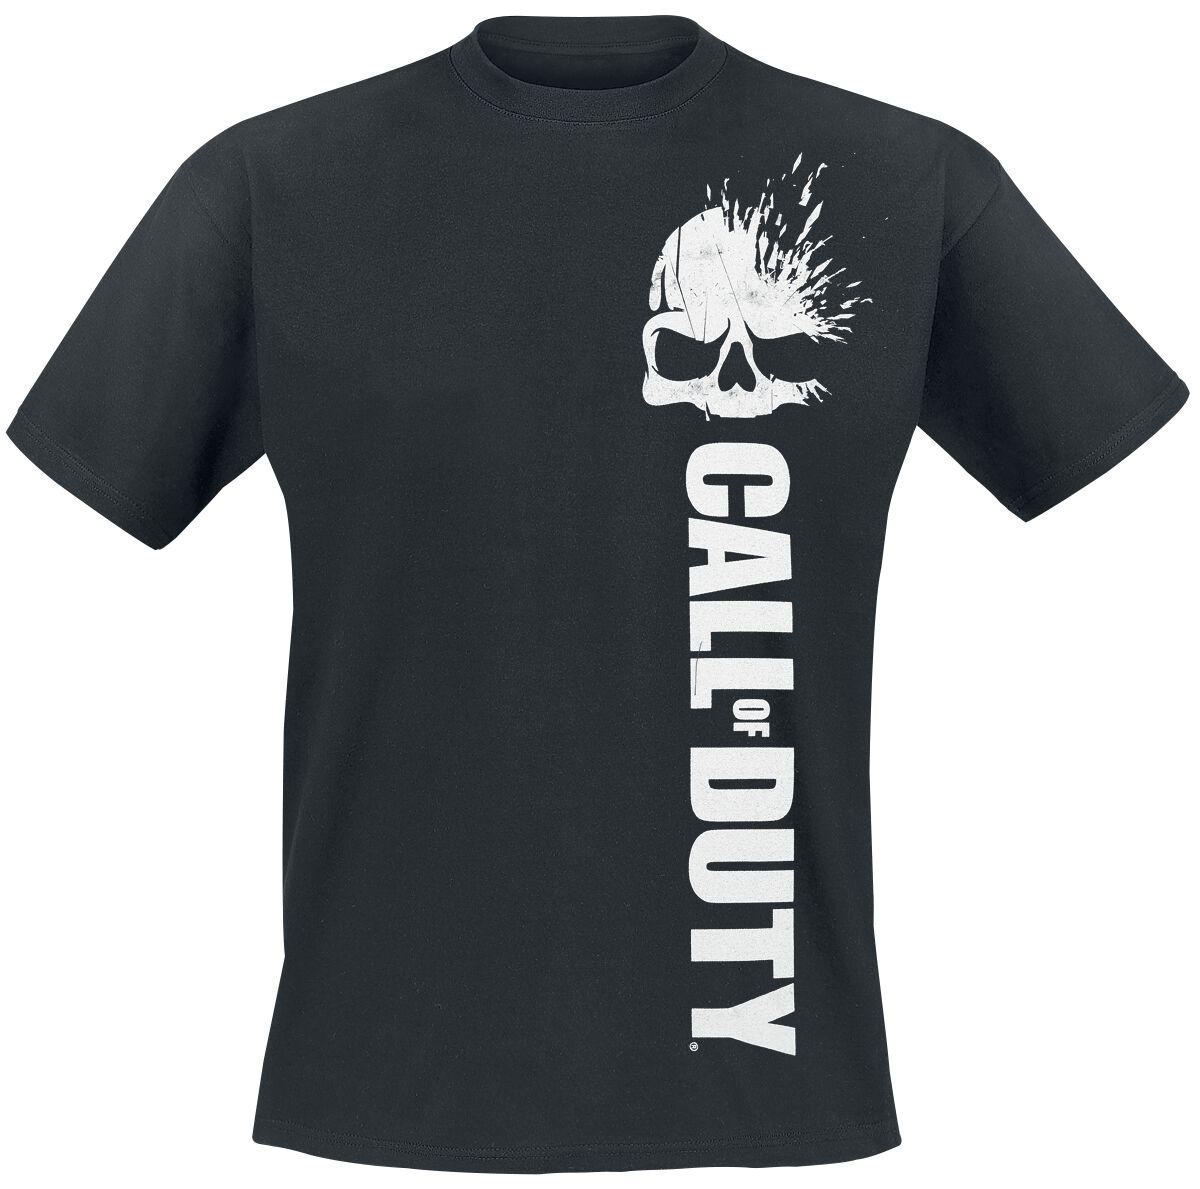 Merch dla Fanów - Koszulki - T-Shirt Call Of Duty Skull Vertical Logo T-Shirt czarny - 359389